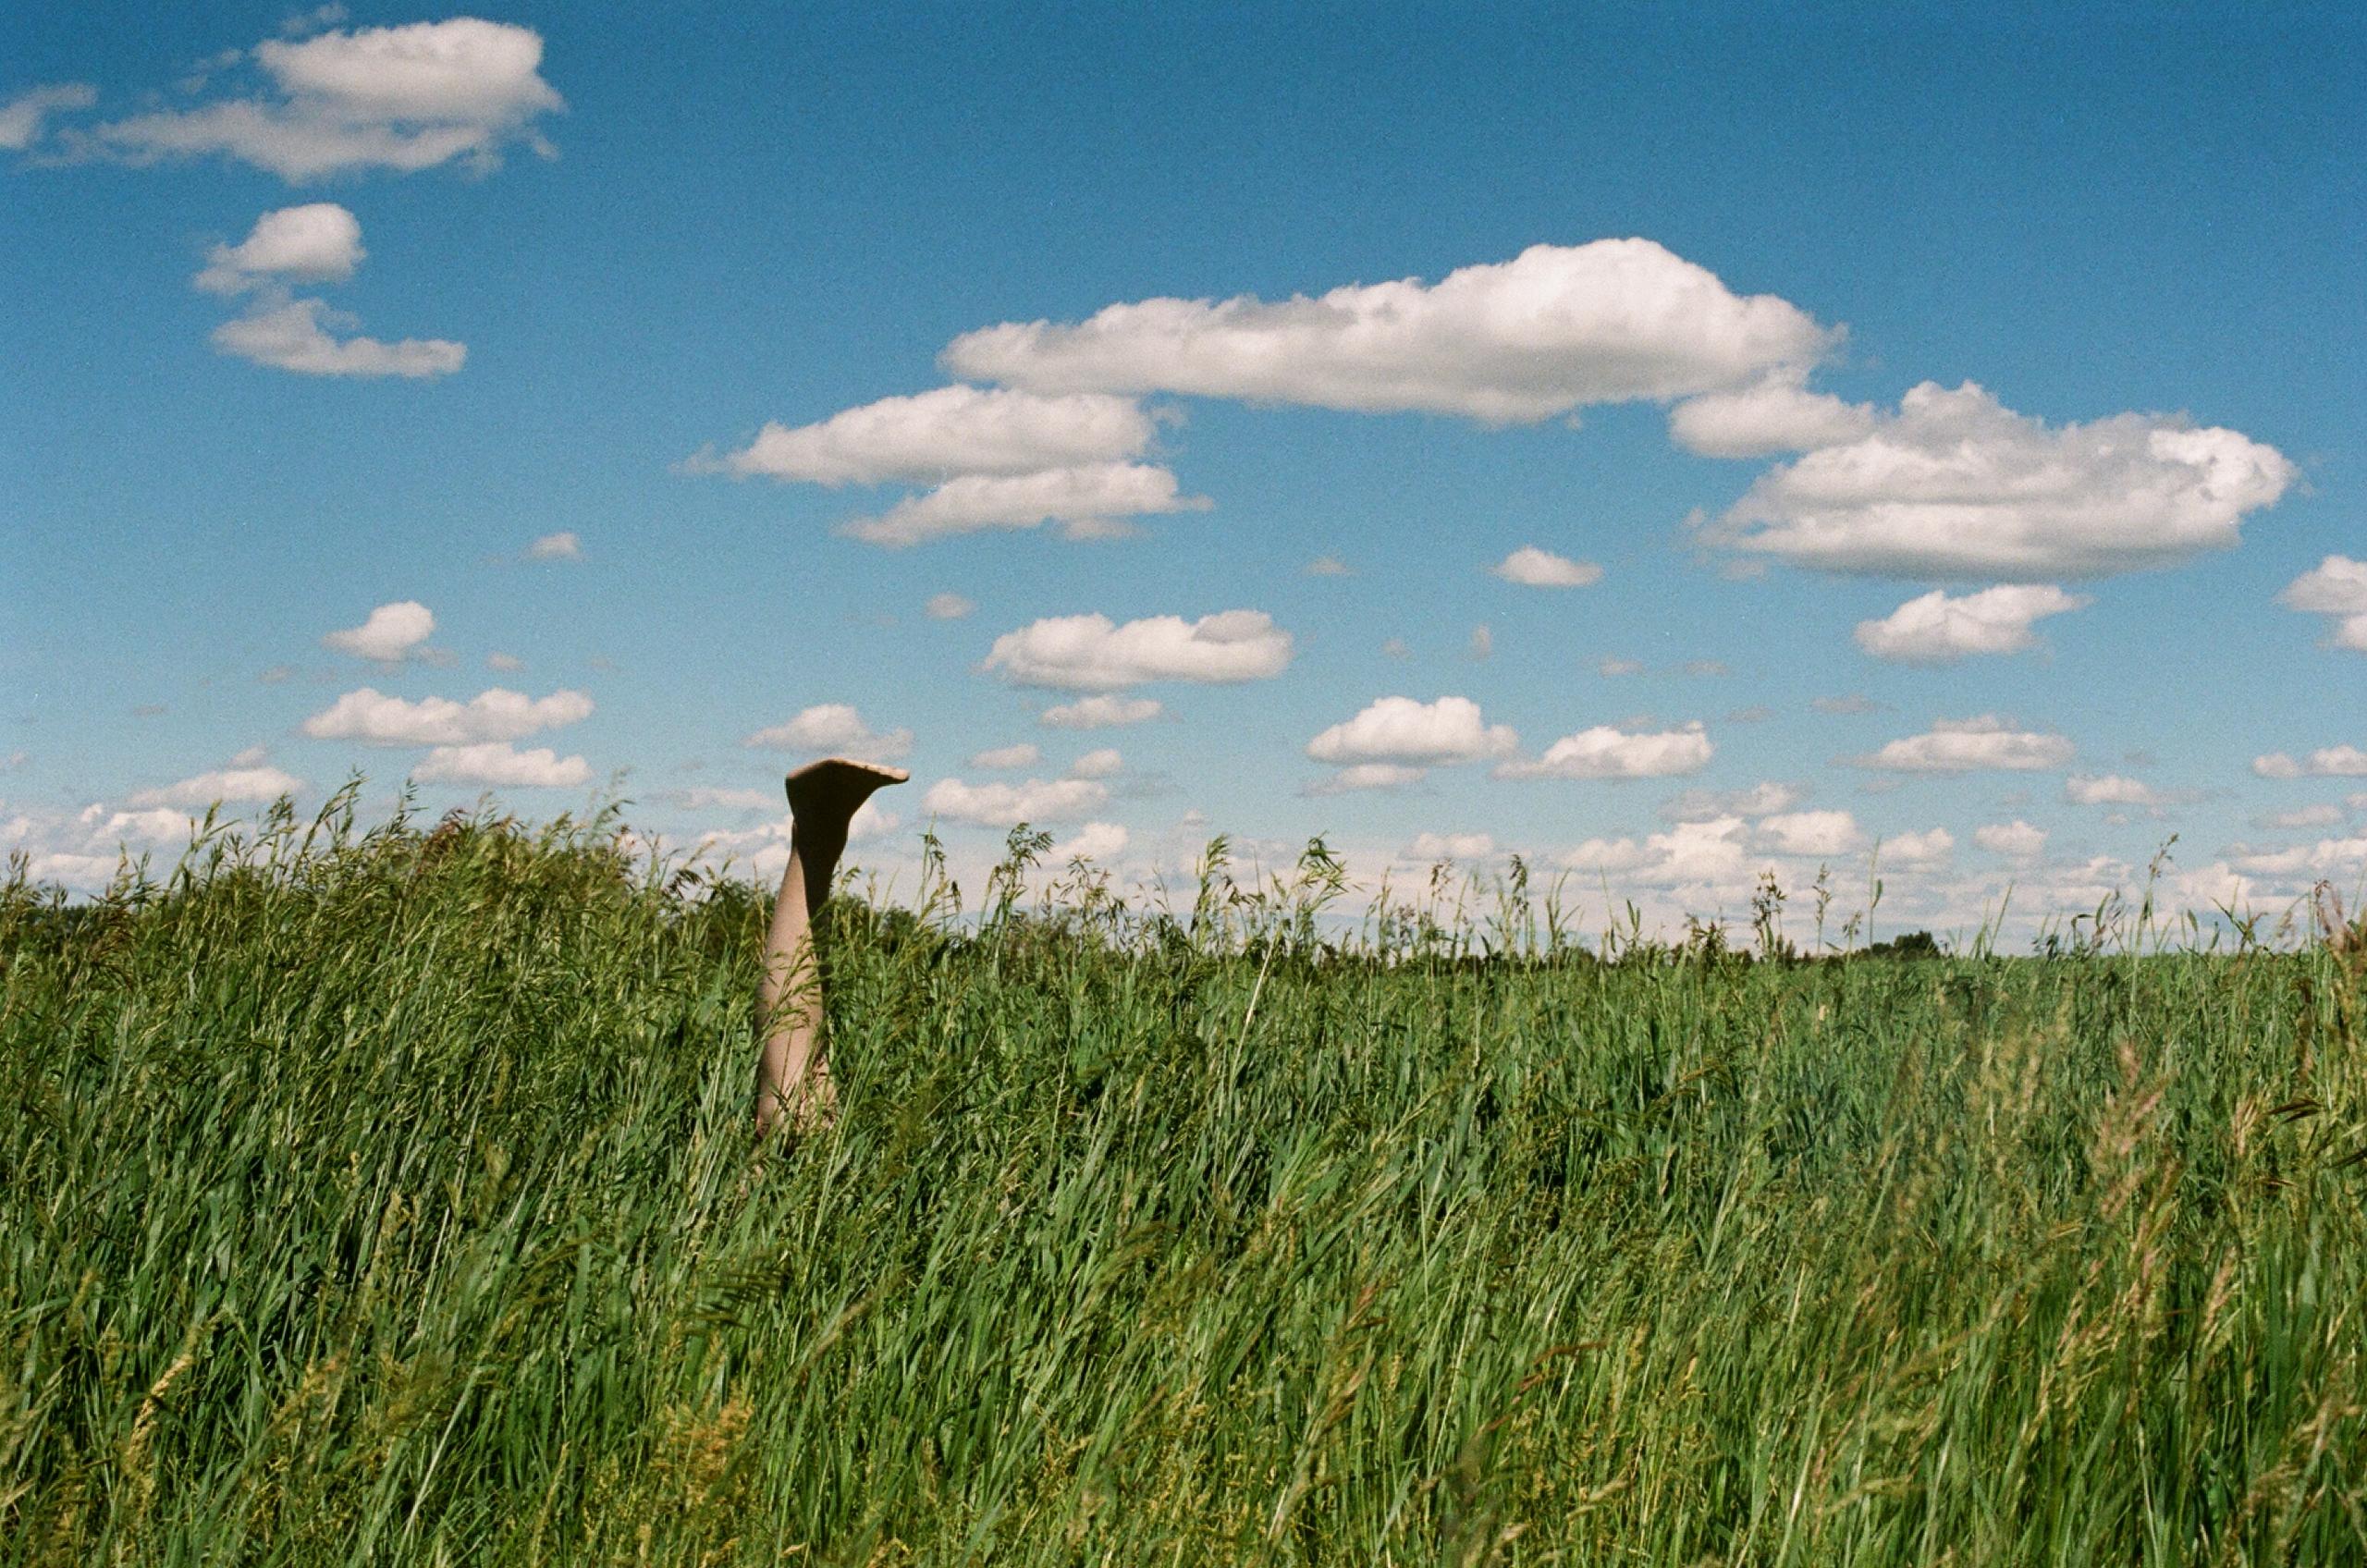 Feet sky - film, filmphotography - alaskapalms   ello